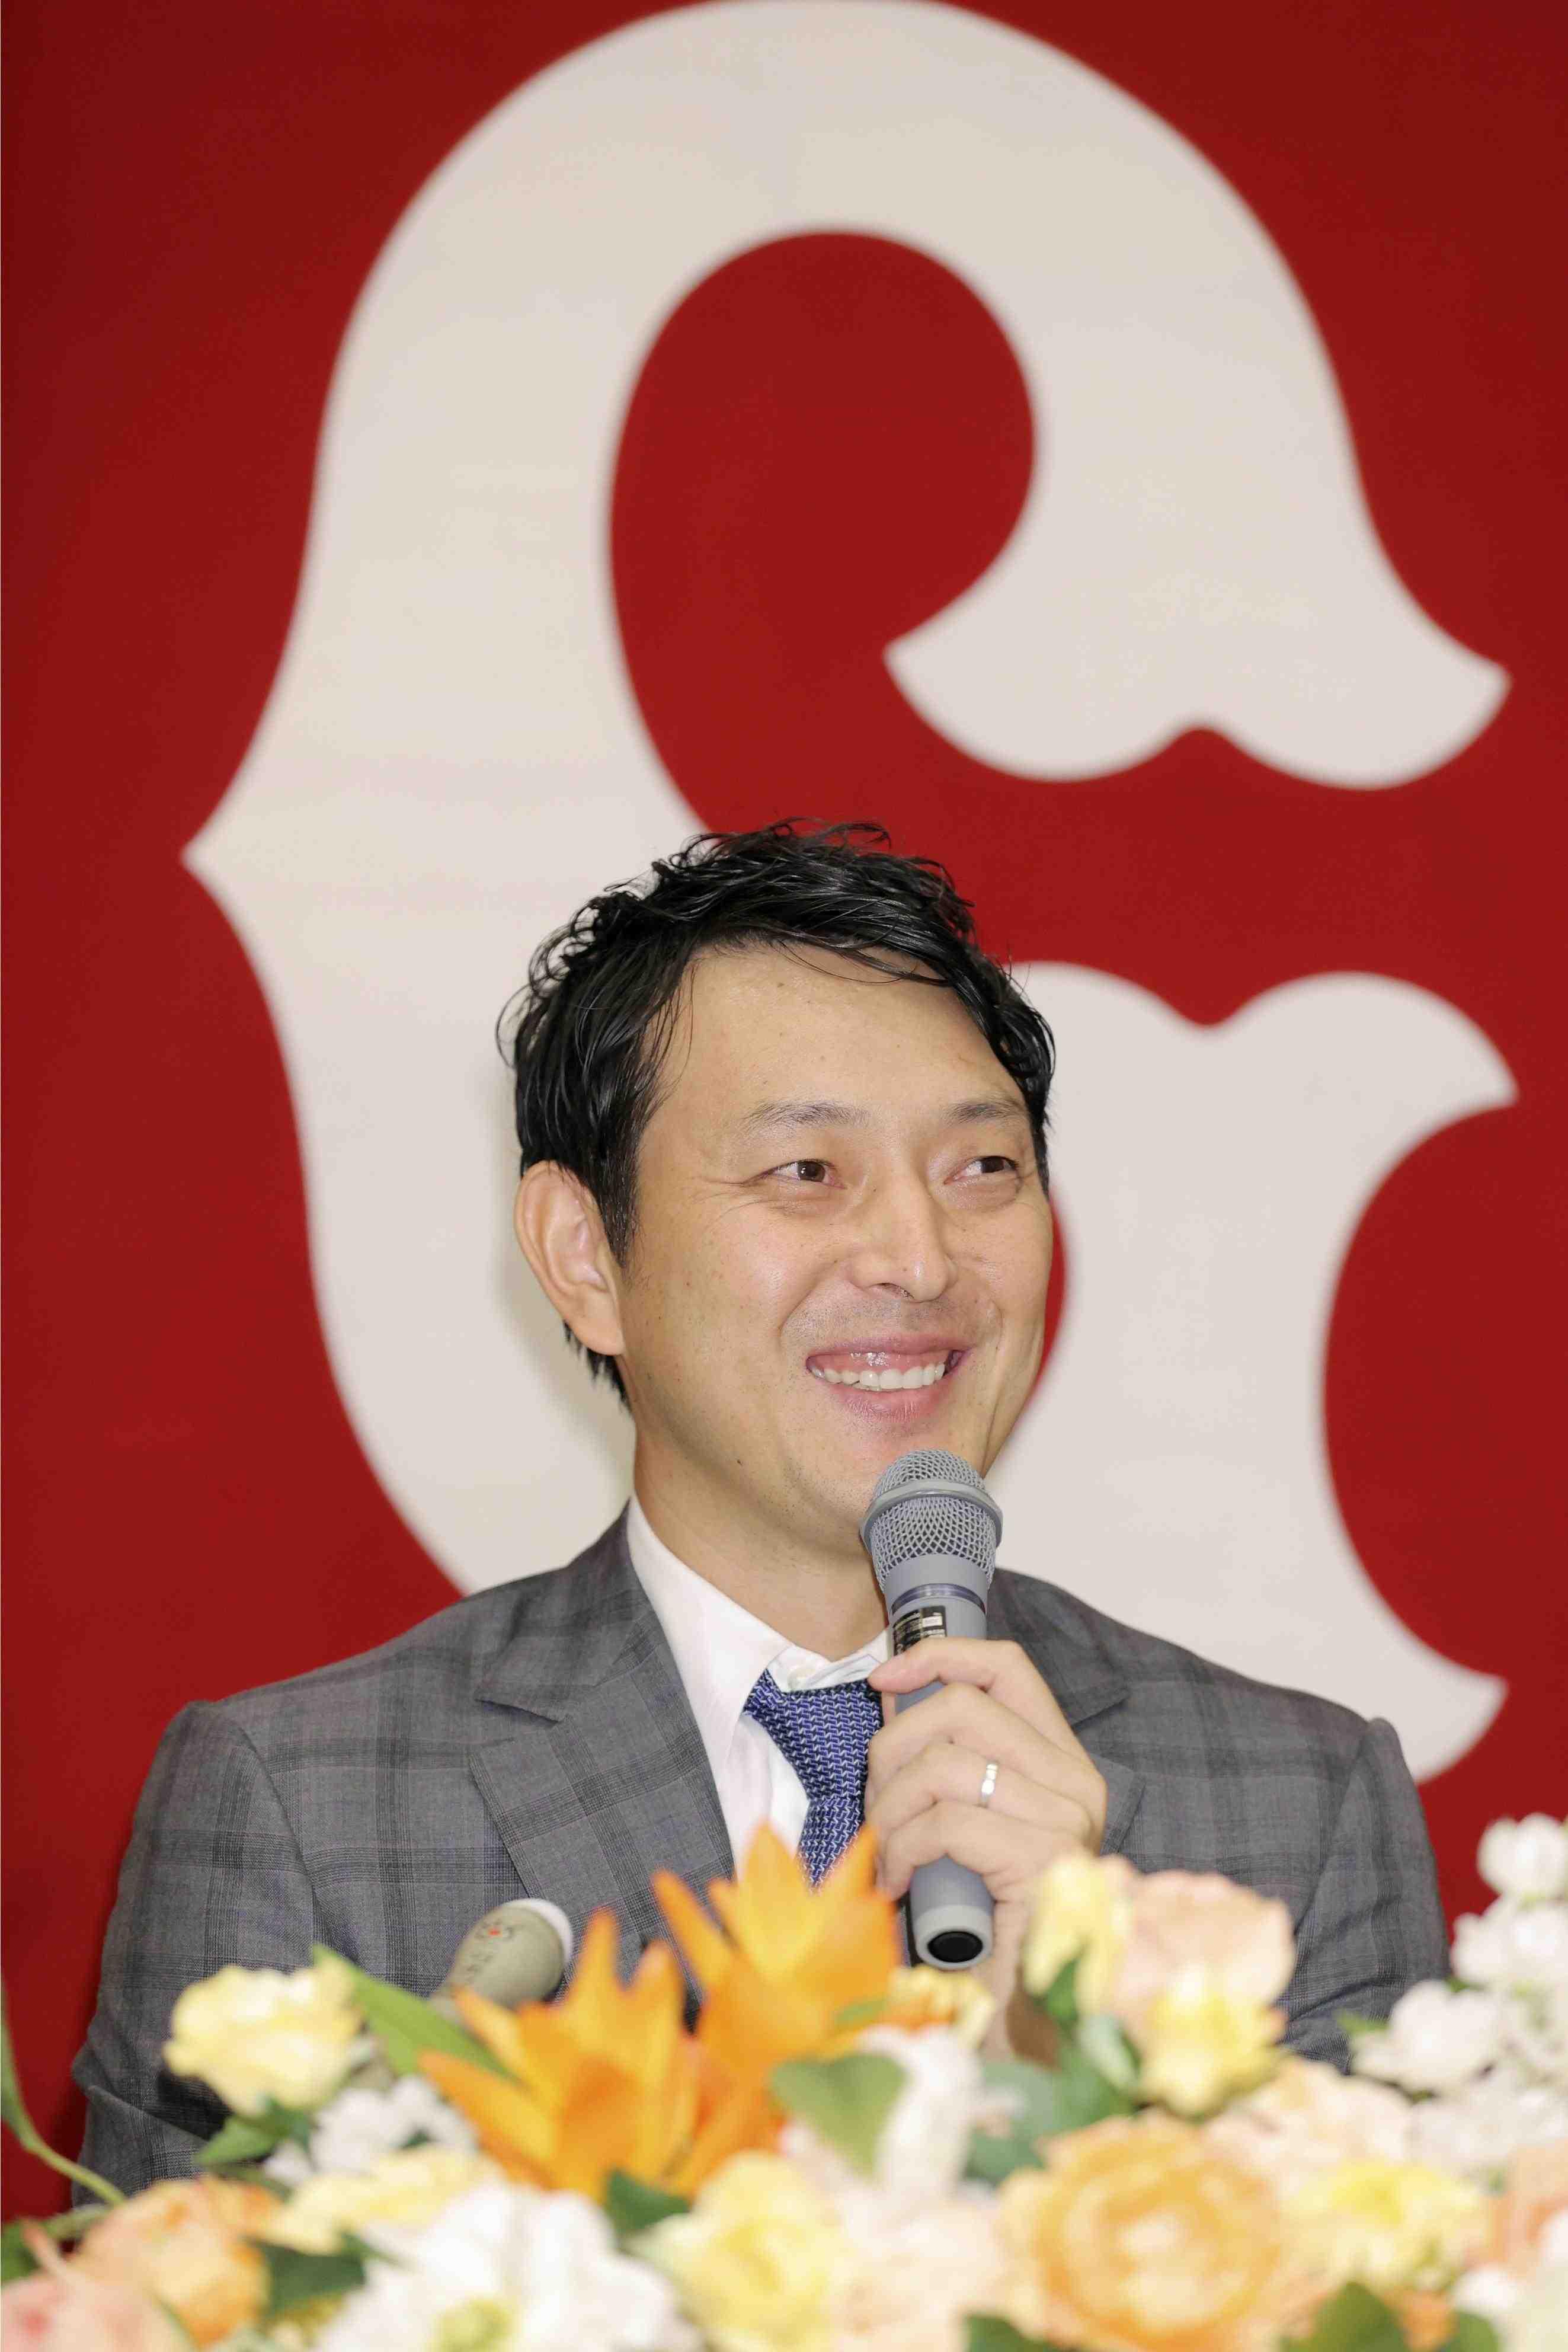 Baseball veteran pitcher Hisashi Iwakuma 010